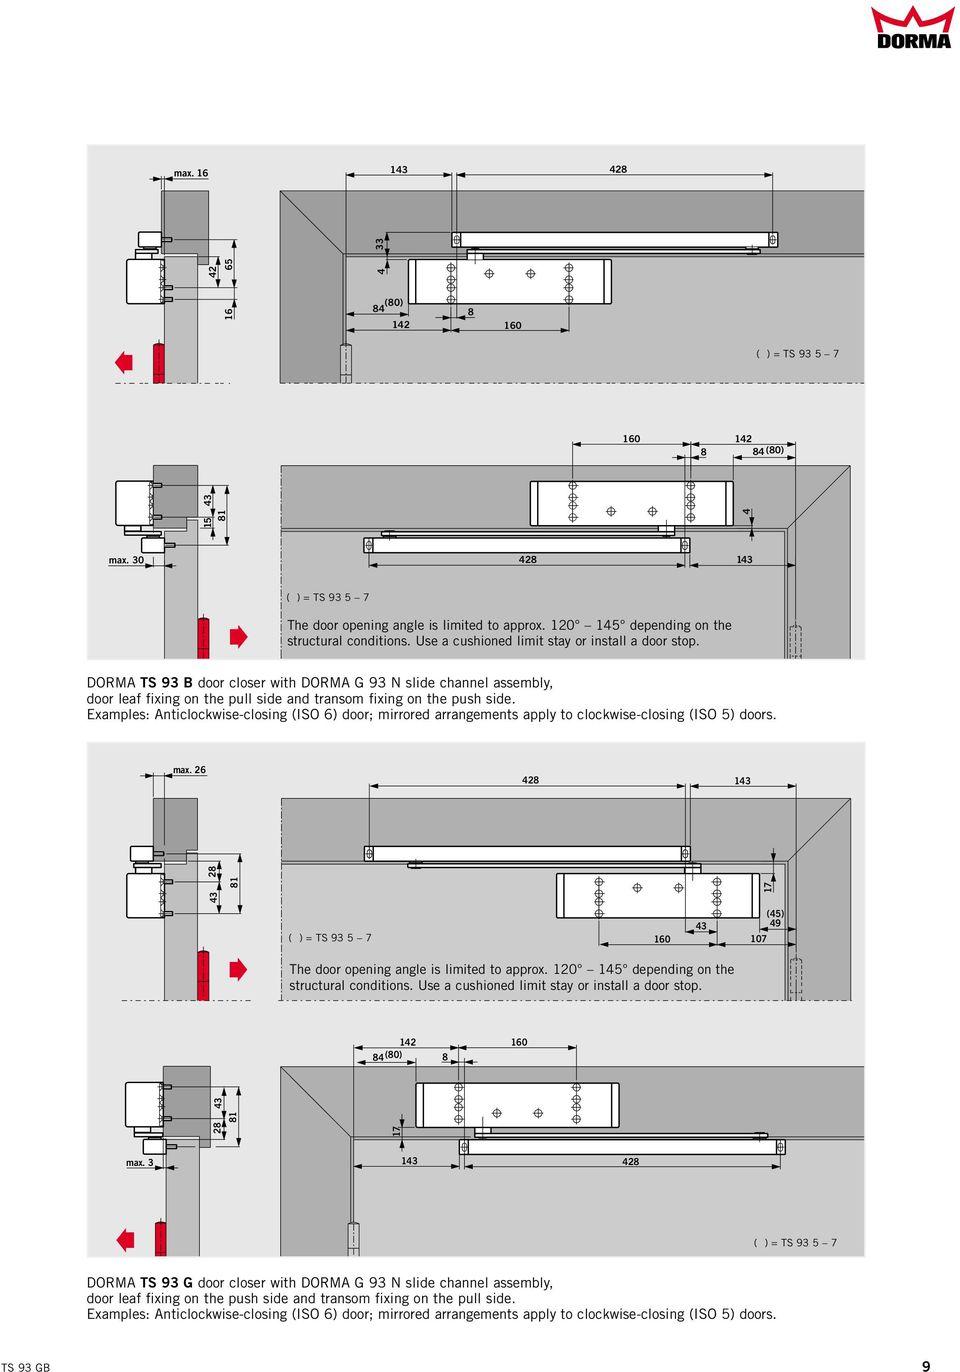 hight resolution of dorma ts 93 b door closer with dorma g 93 n slide channel assembly door